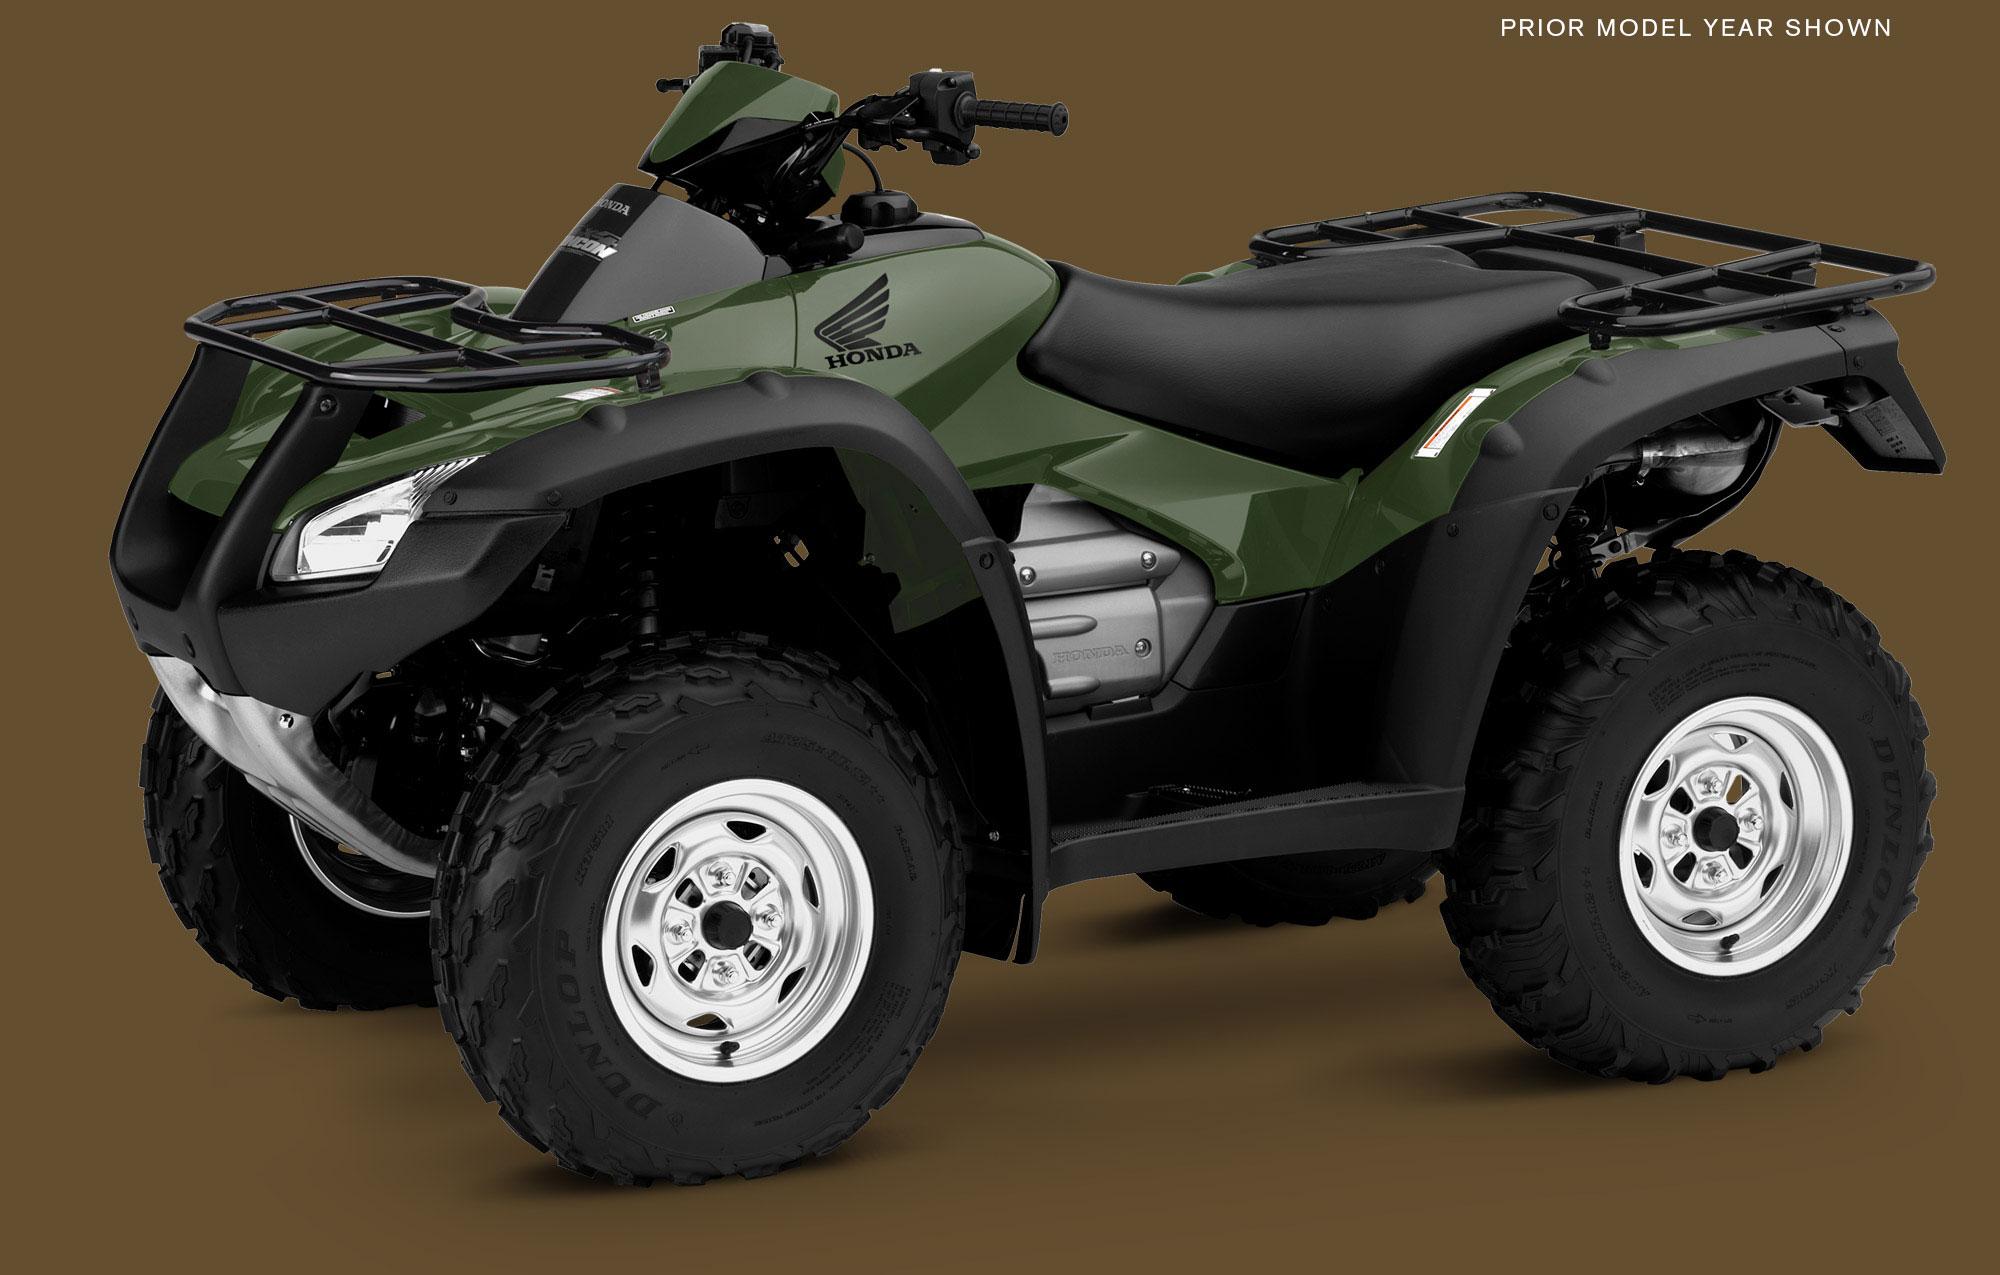 Honda Unveils 2015 Four Trax Rincon Top Drawer ATV